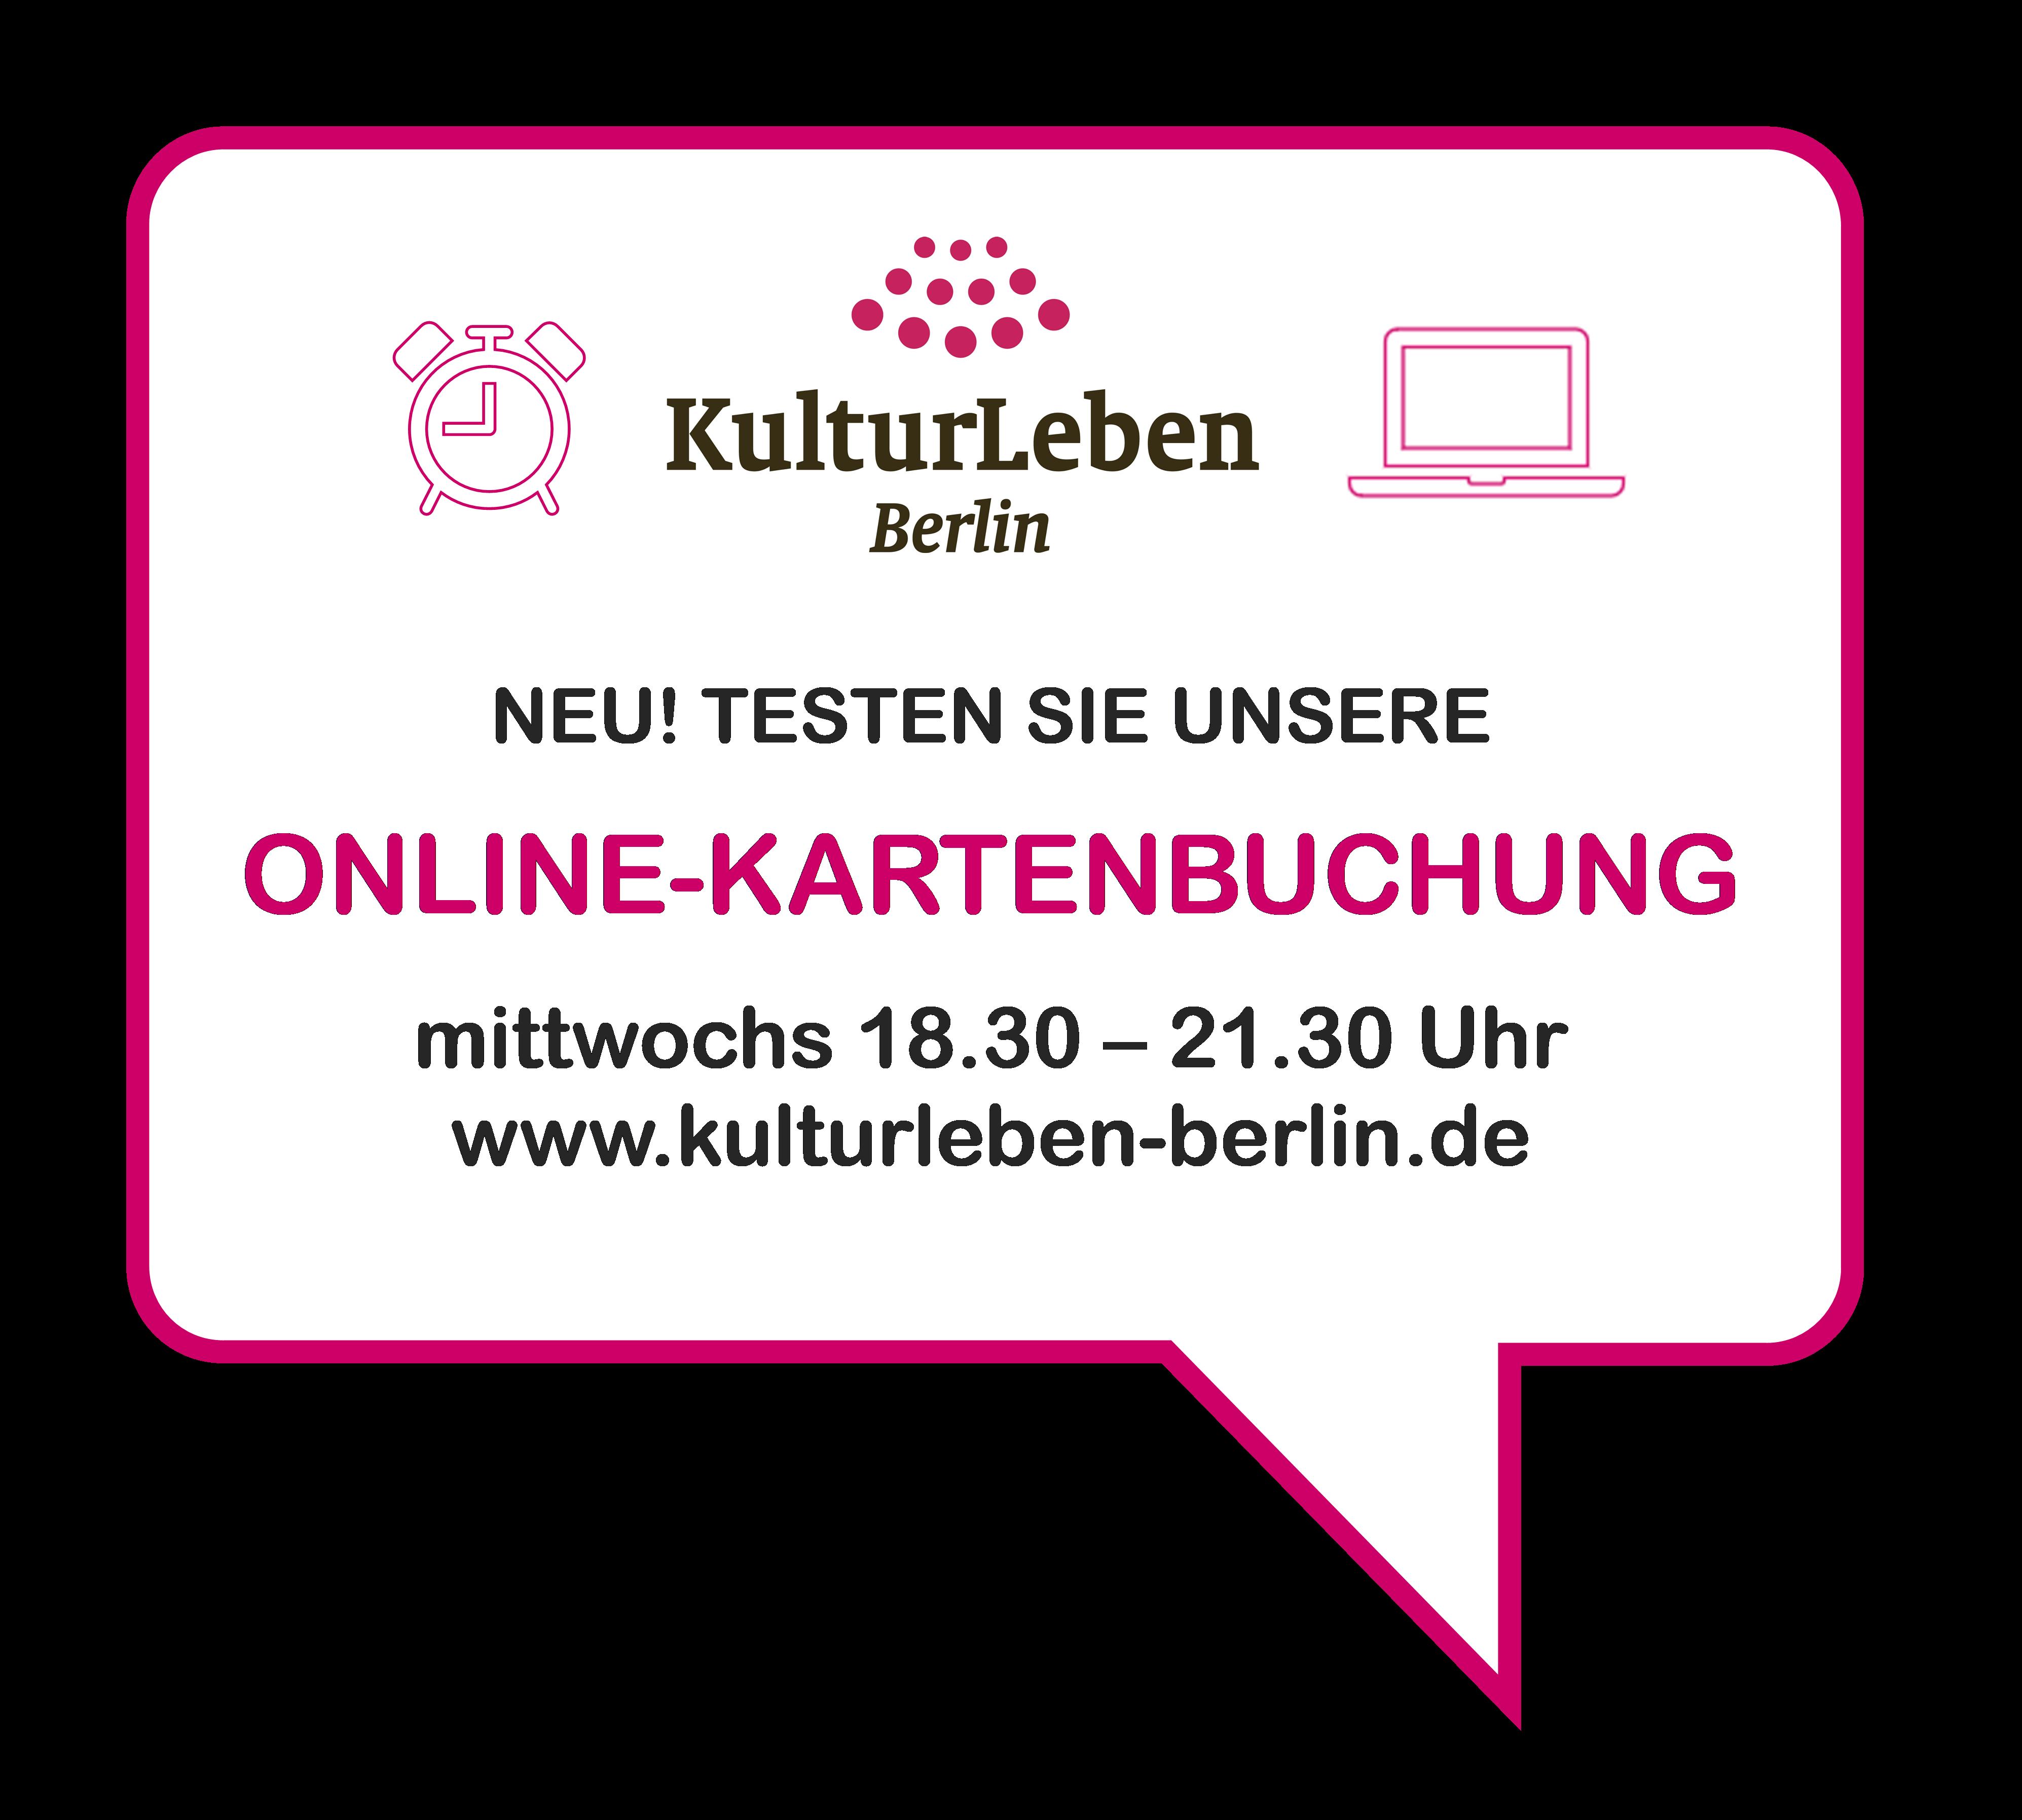 Charmant Builder Software Online Fortsetzen Fotos - Entry Level ...